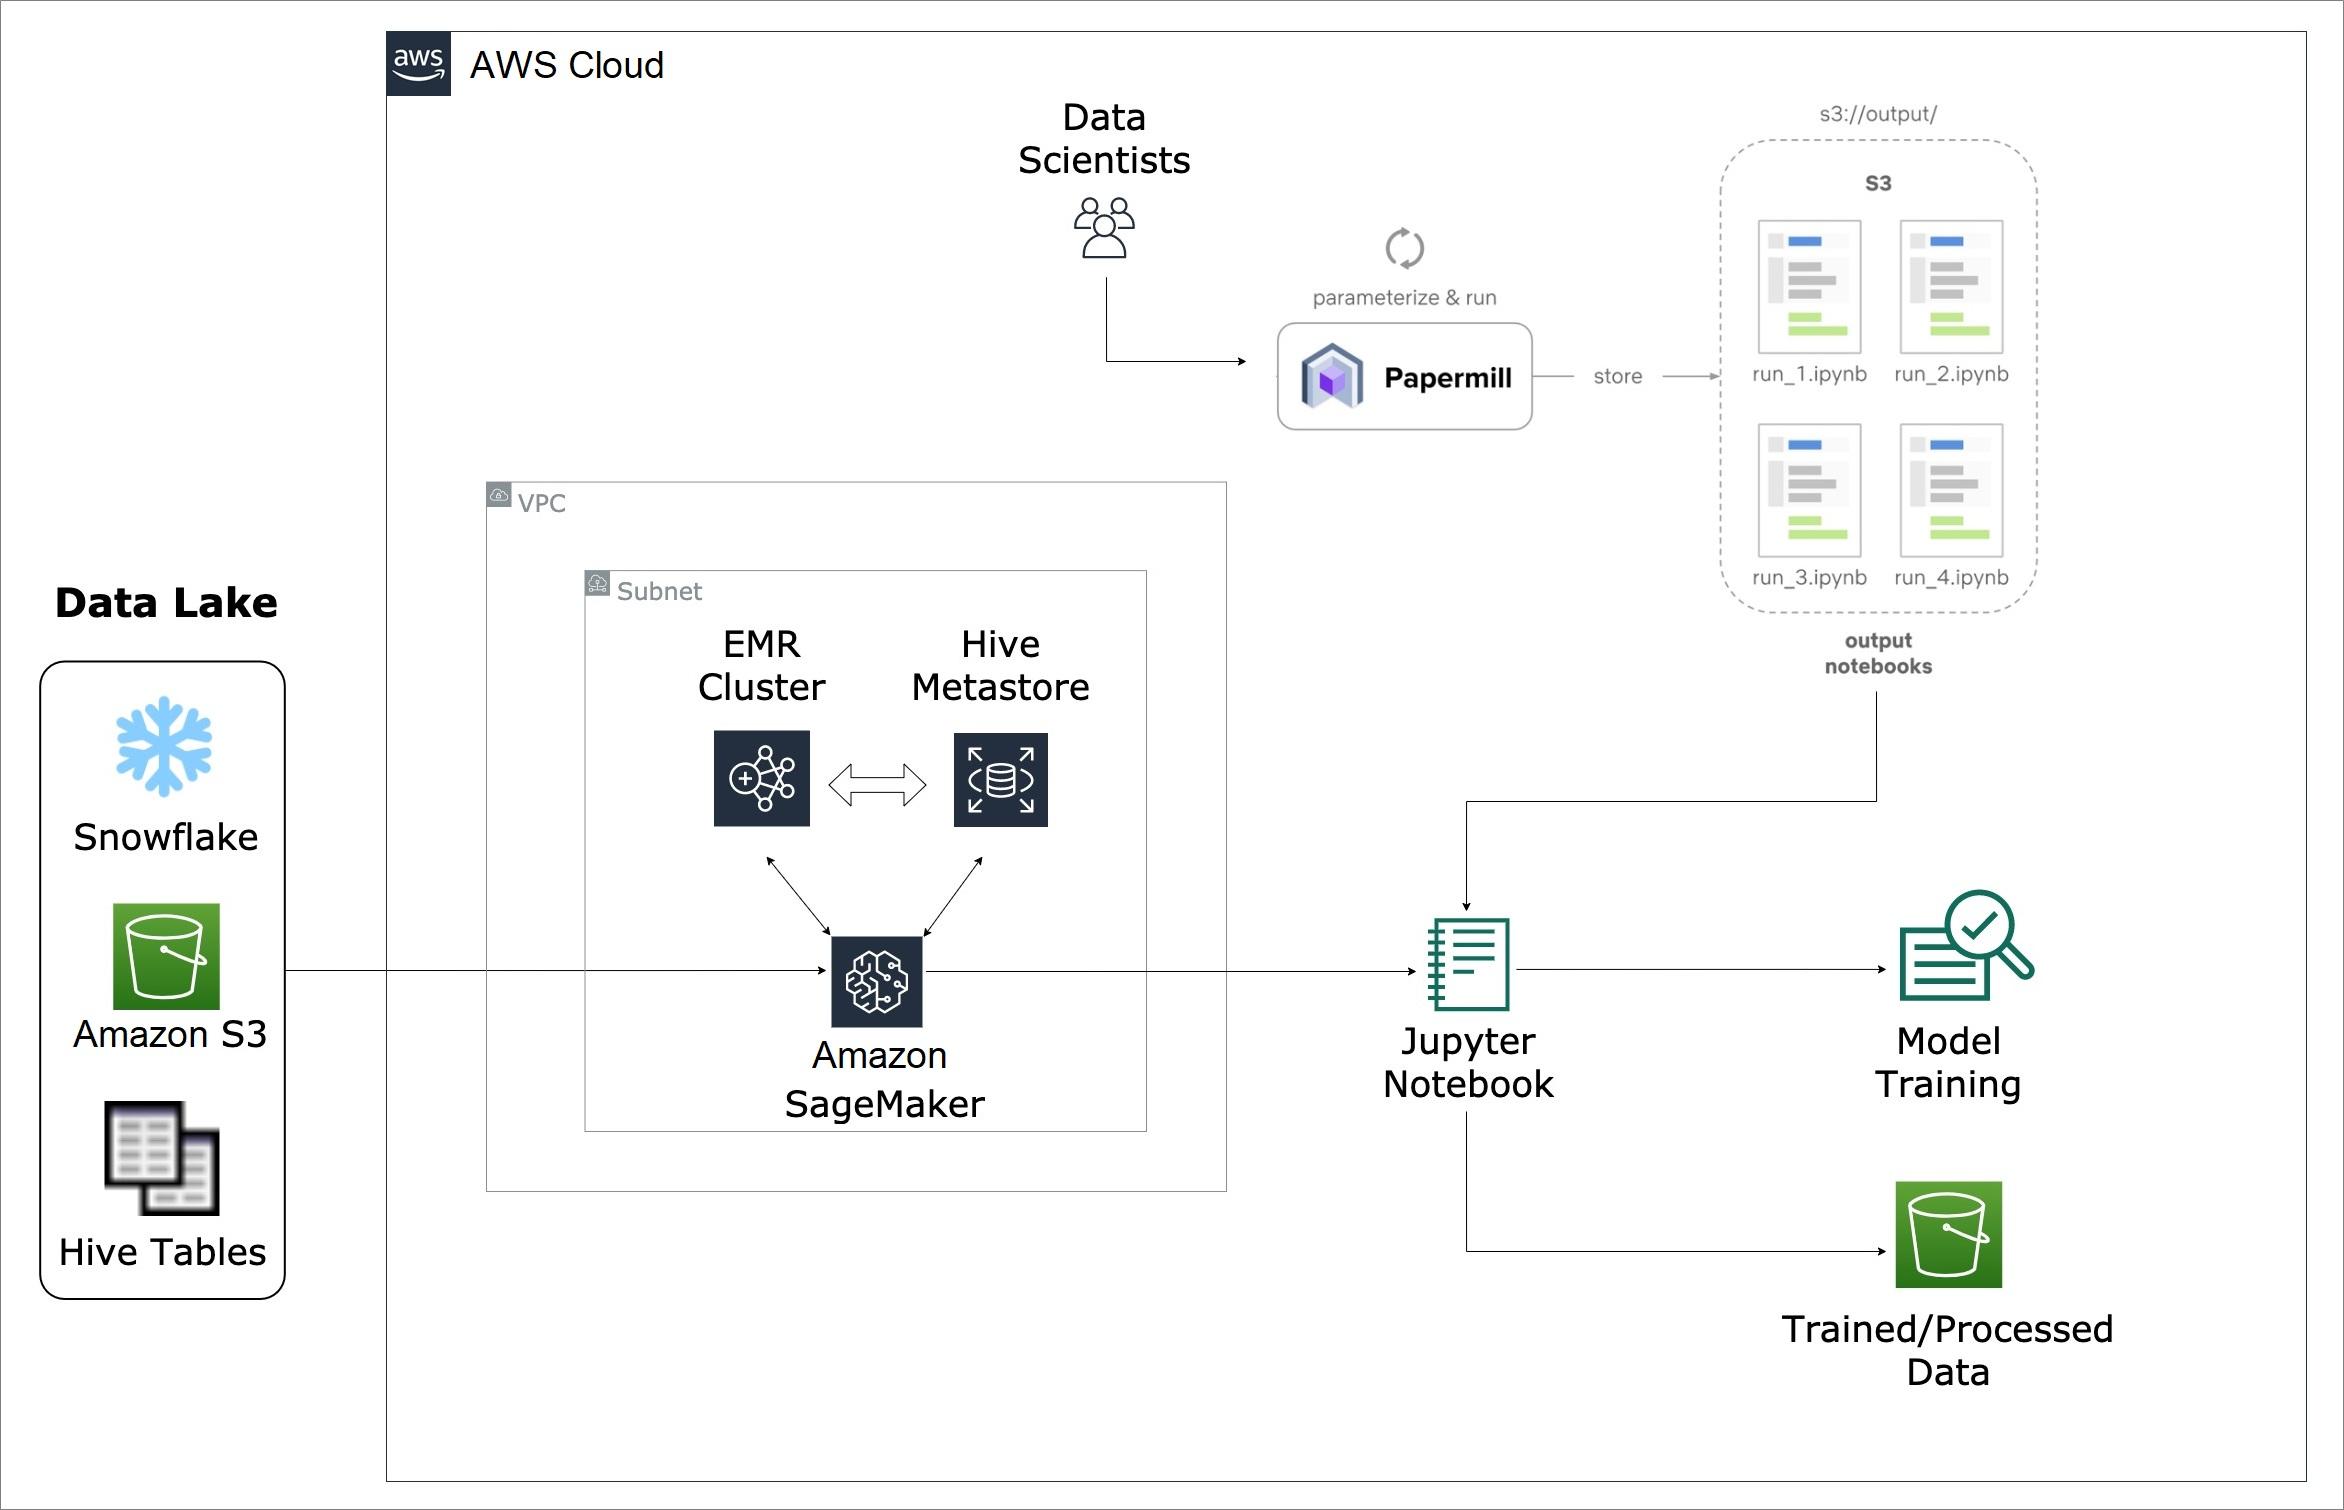 BizCloud-Amazon-SageMaker-4